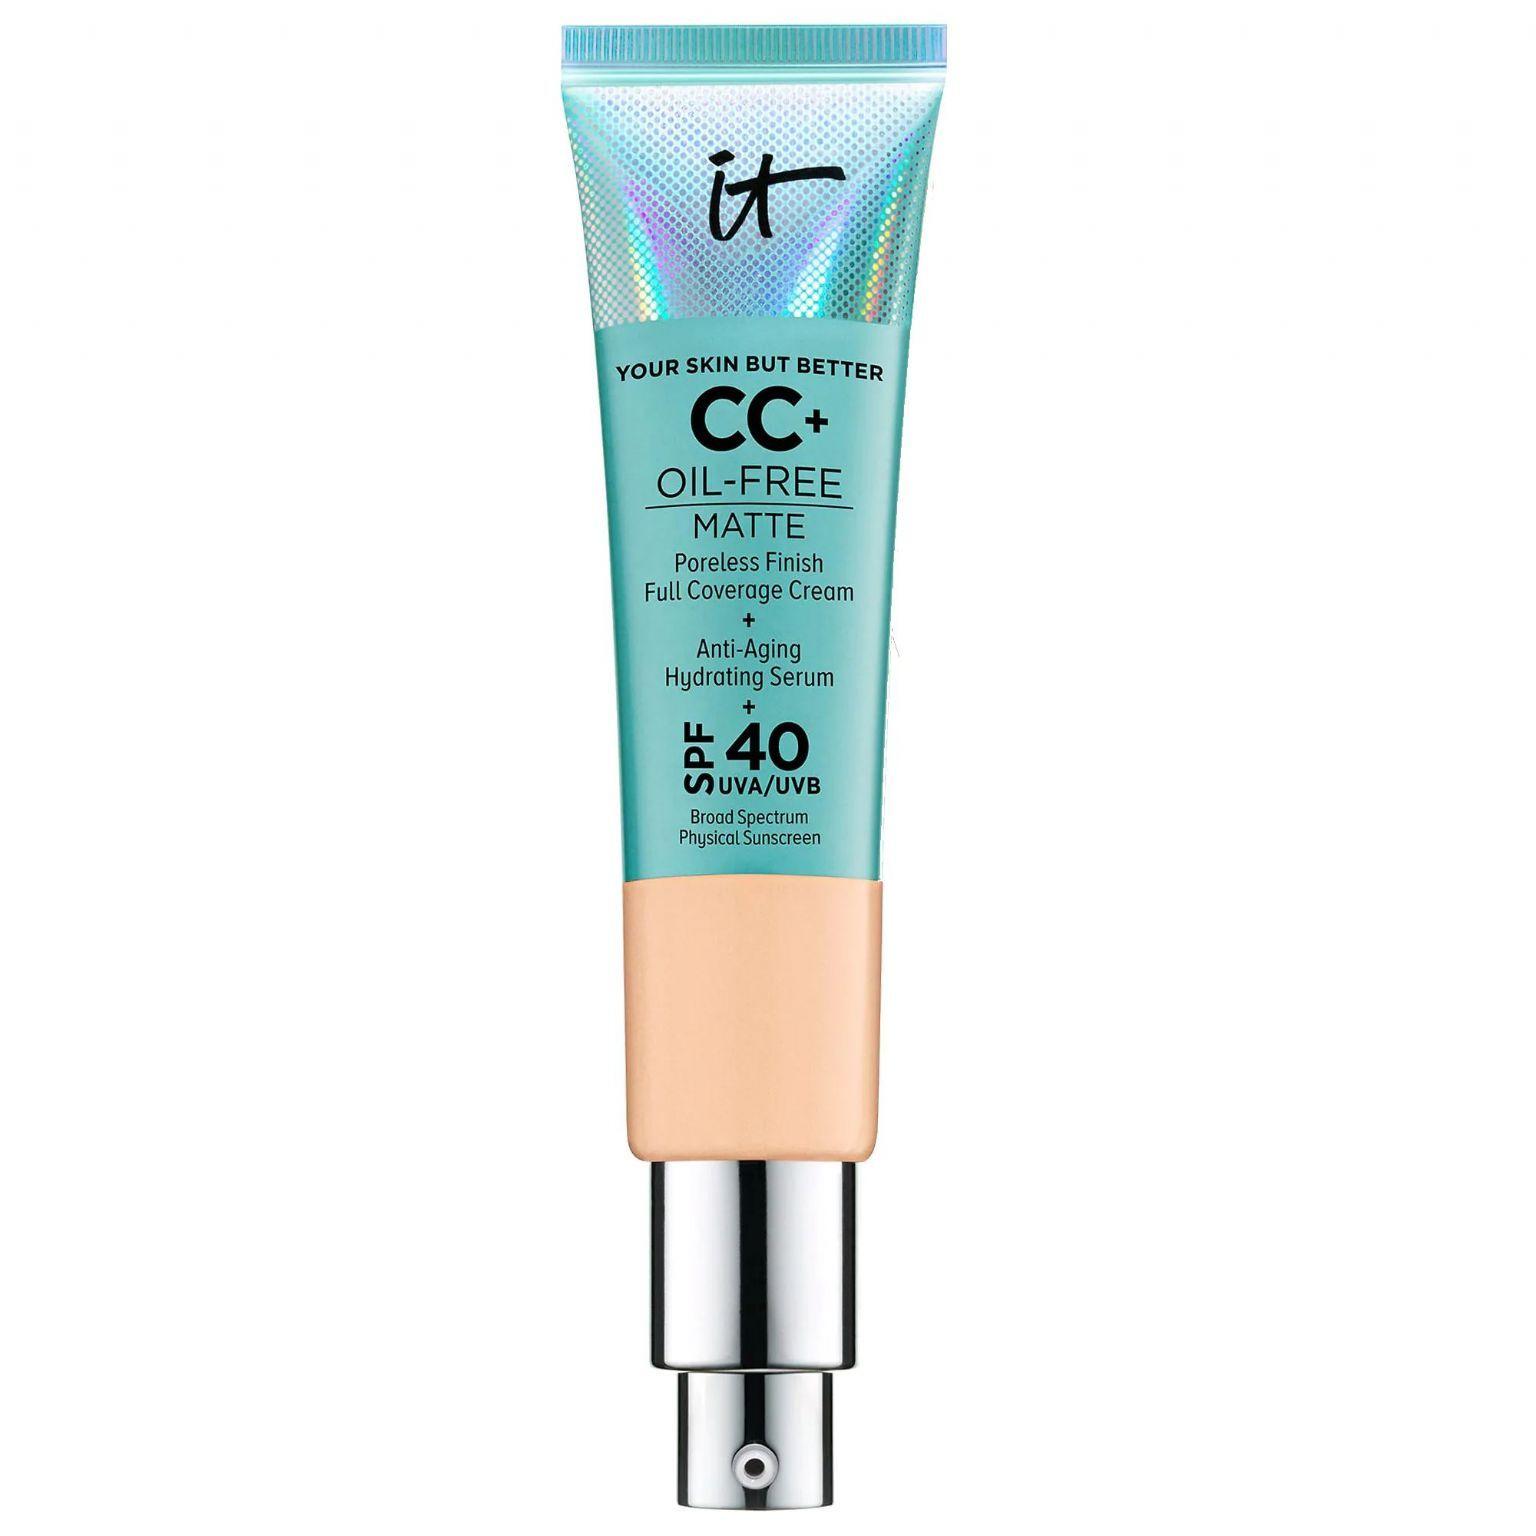 Your Skin But Better CC+ Cream Oil-Free Matte w/ SPF 40